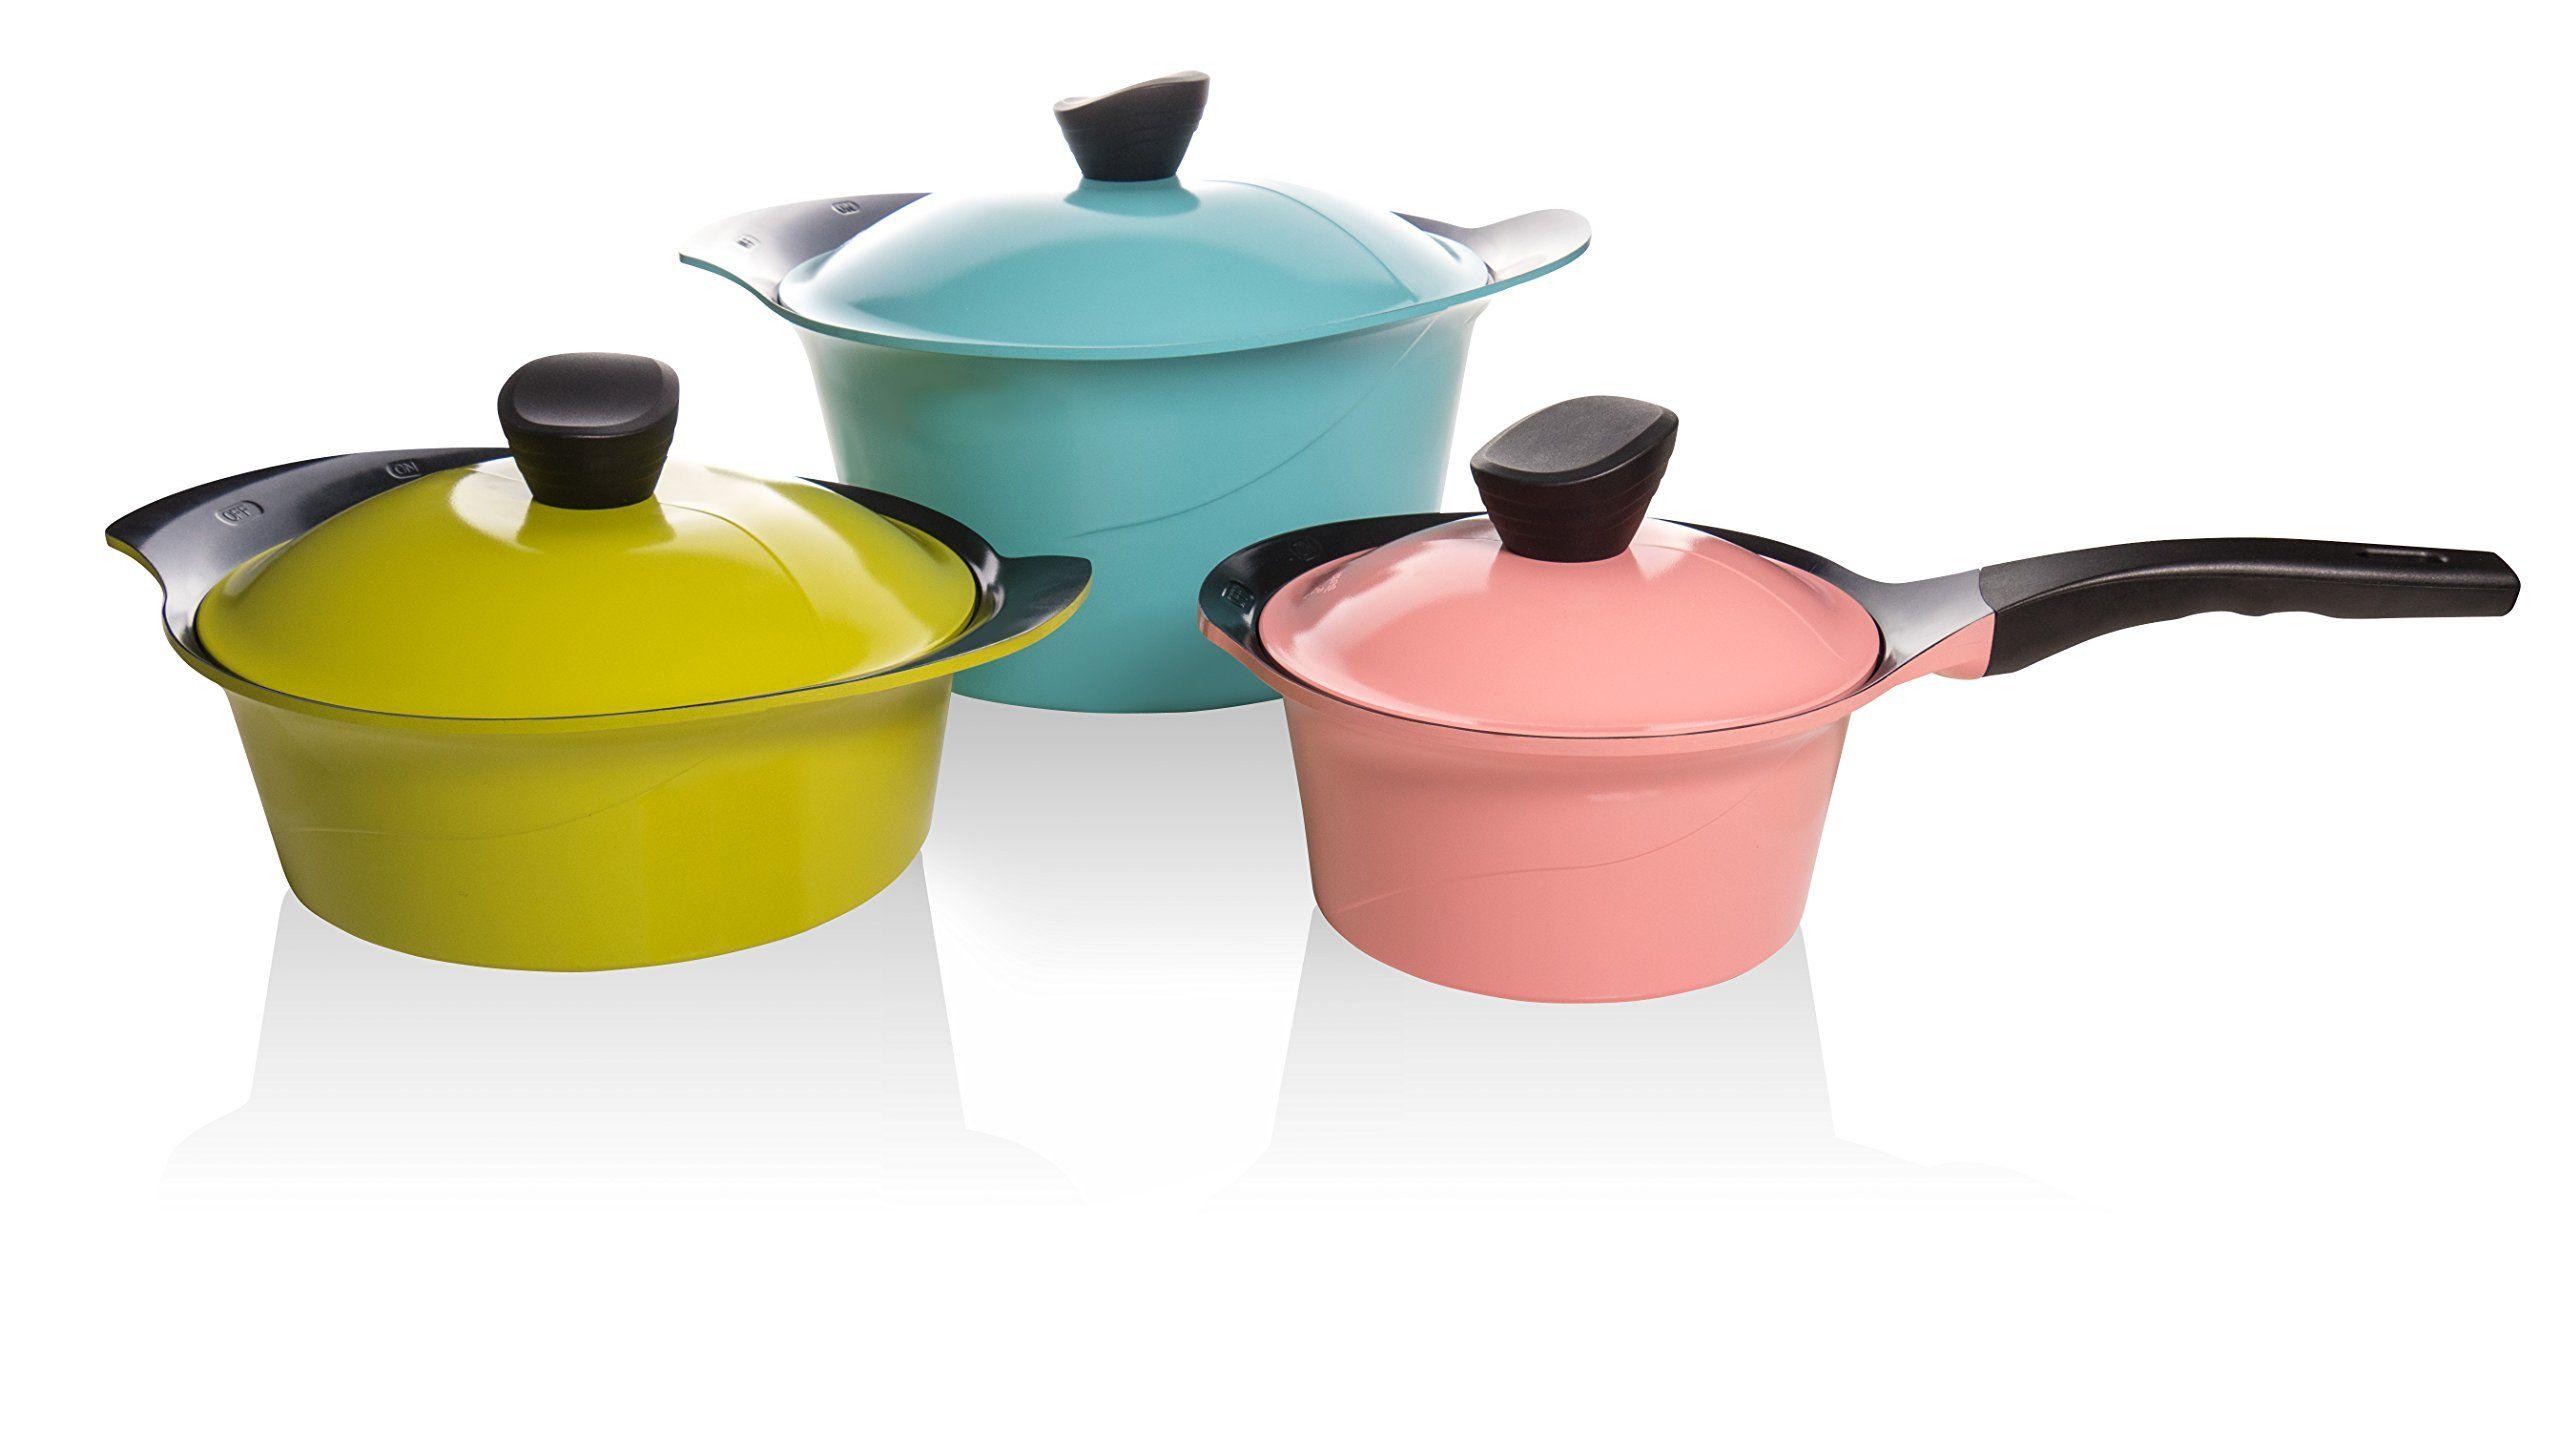 Denmark® 10-Piece Ceramic Nonstick Aluminum Cookware Set ... |Colorful Ceramic Cookware